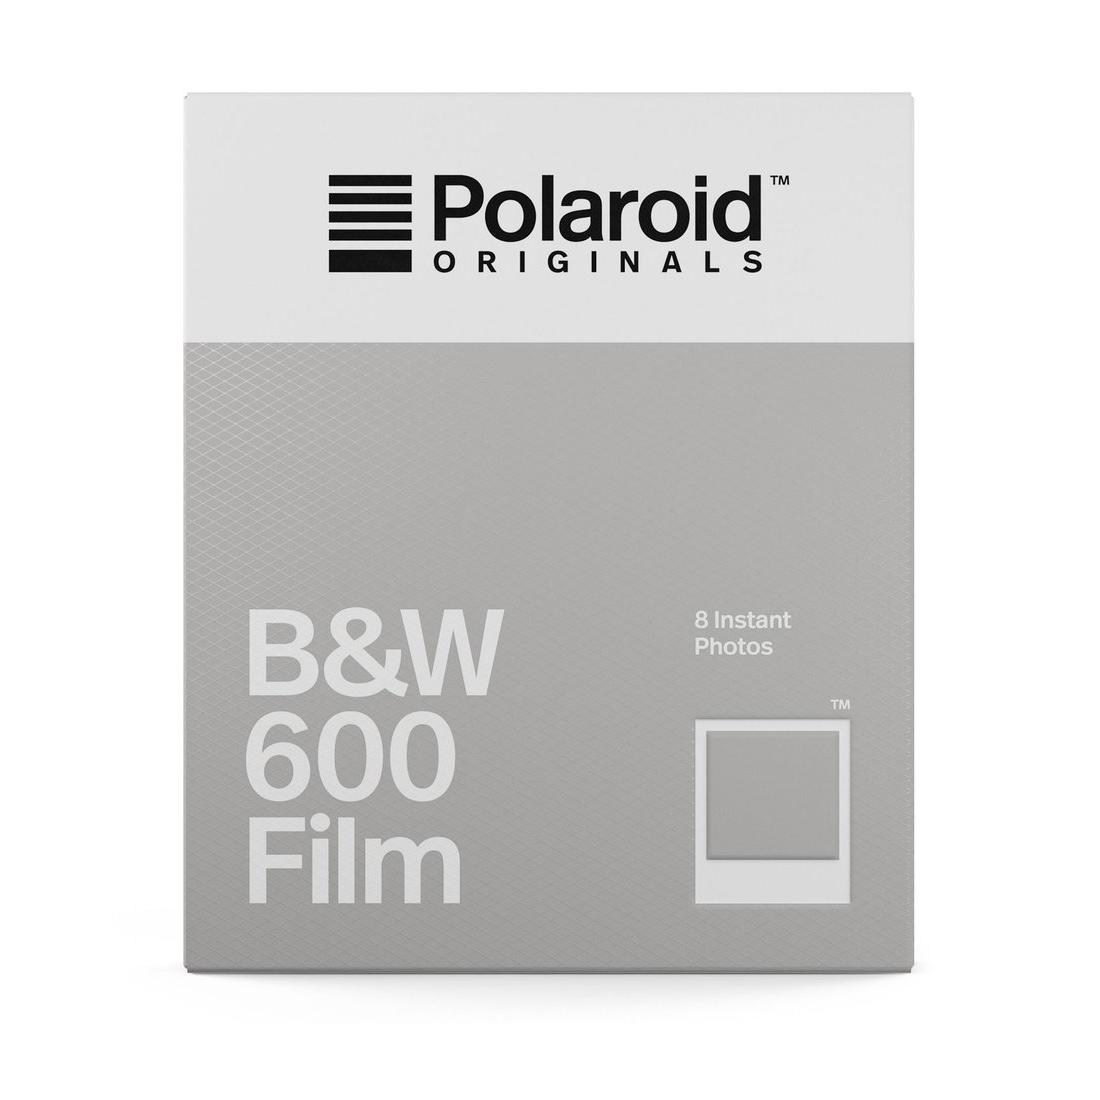 B&W Film For 600